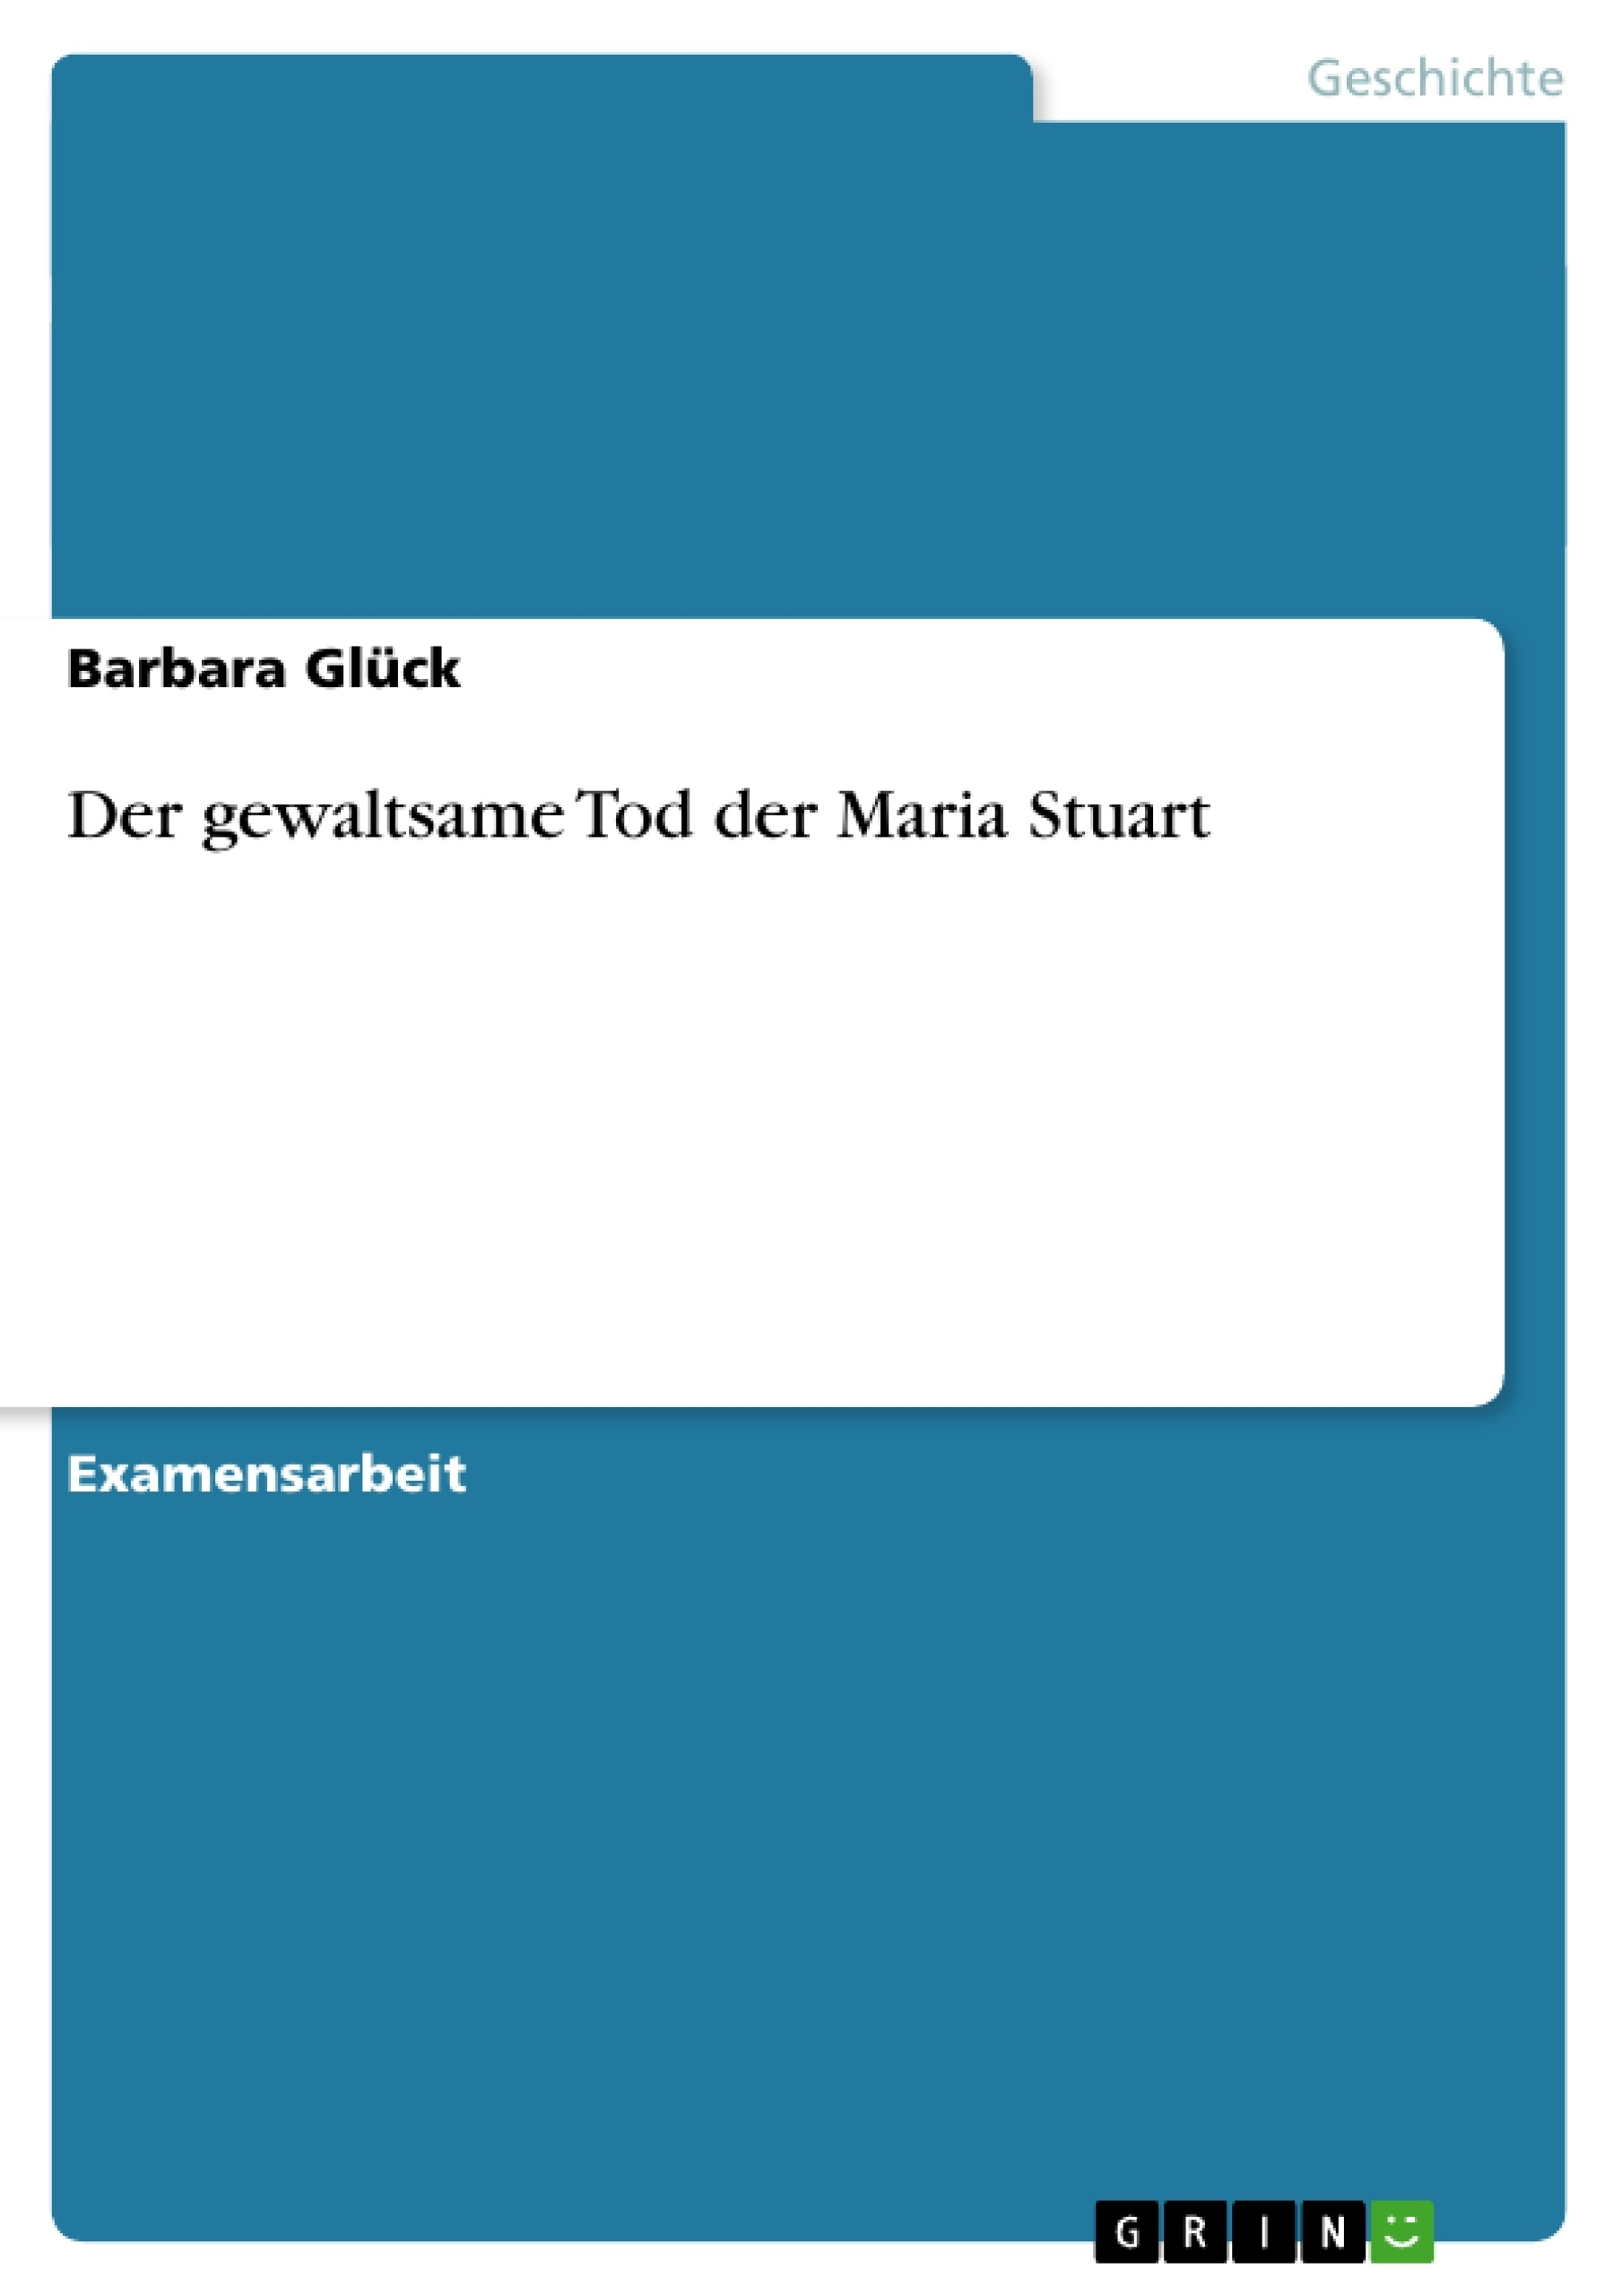 Titel: Der gewaltsame Tod der Maria Stuart